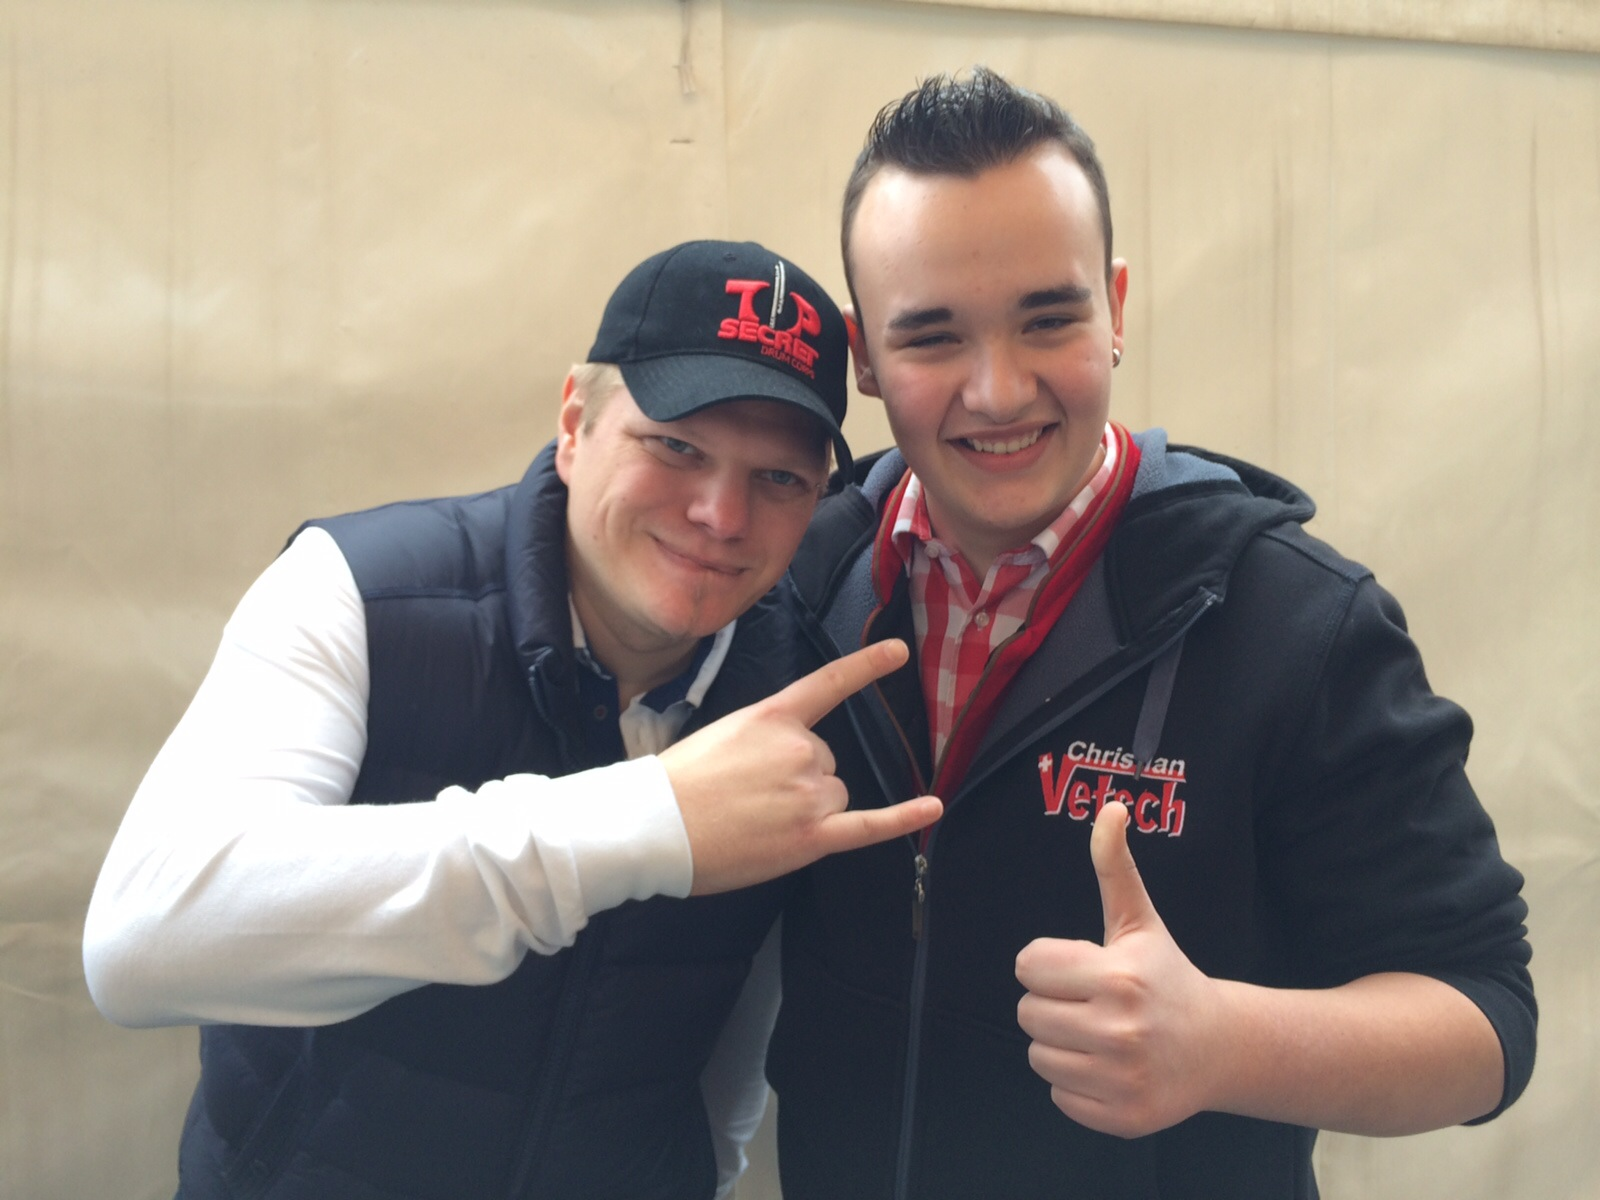 Wolfgang Lindner und Christian Vetsch